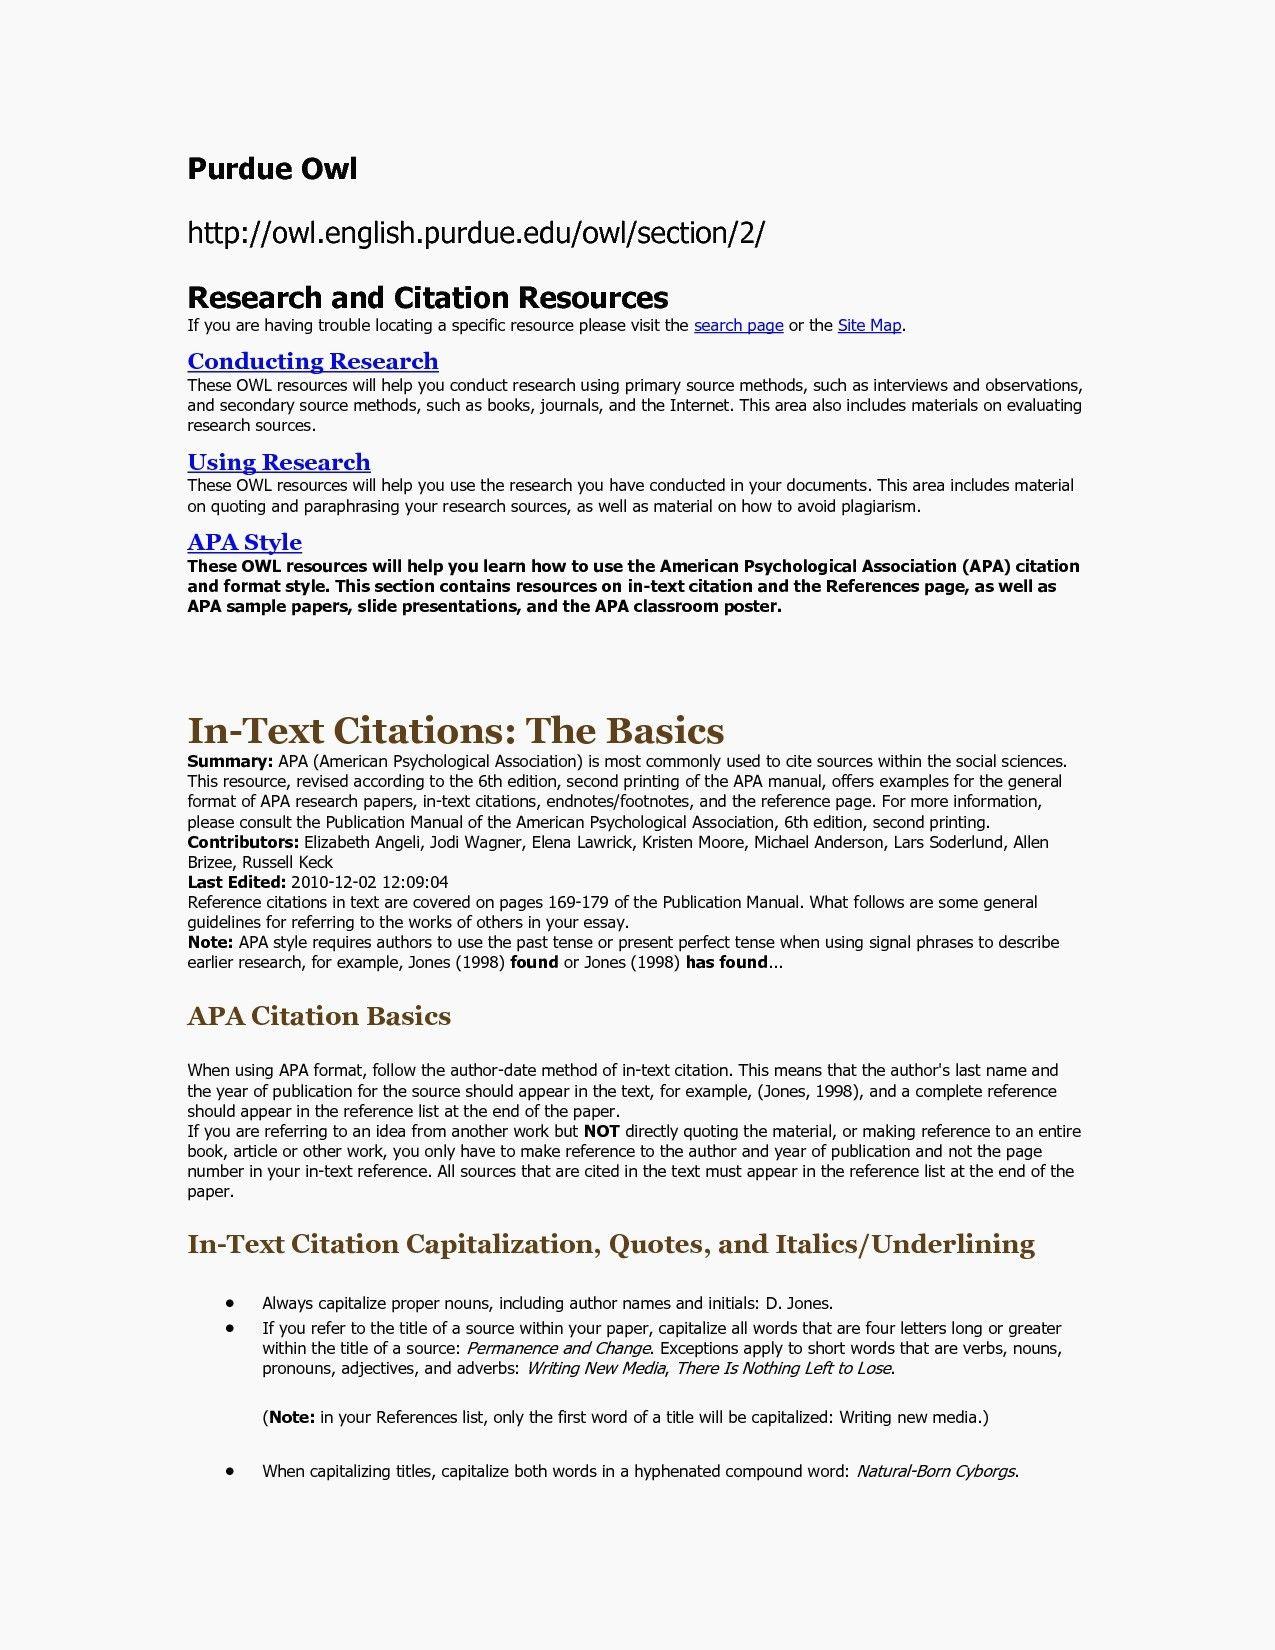 Resume Format Purdue Owl ResumeFormat